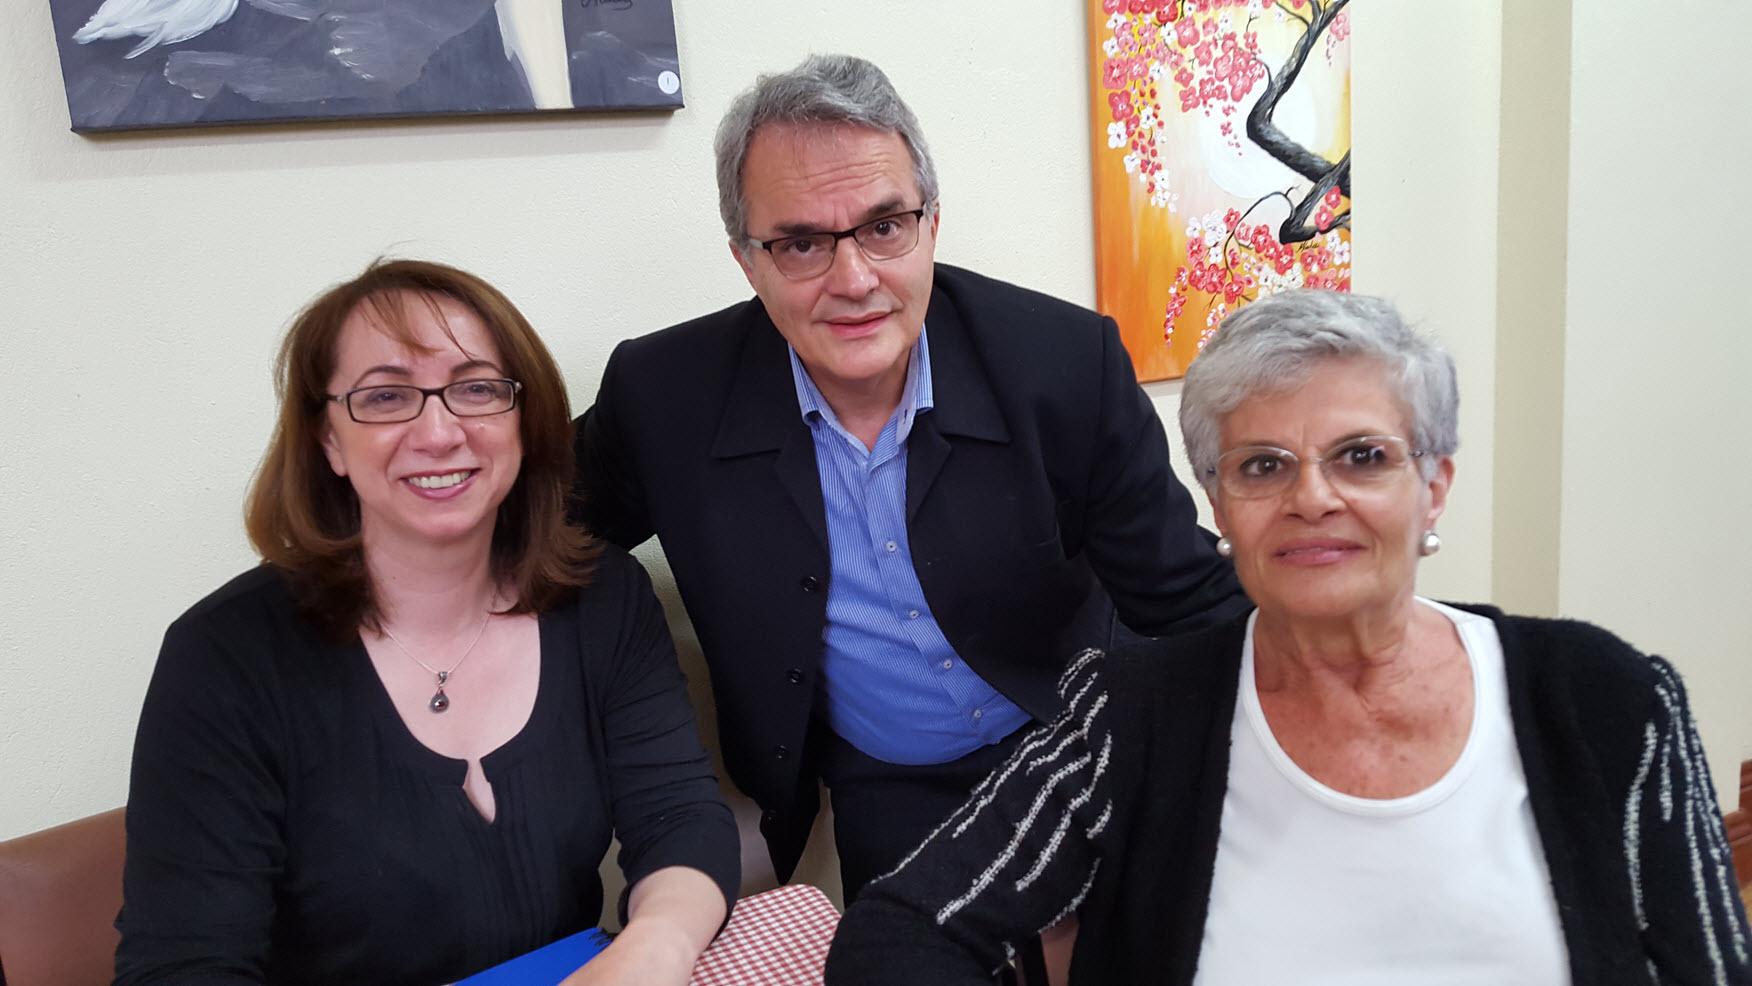 Iakovos Garivaldis among two reporters, Dina Gerolymou from SBS National and Rena Fragioudakis from 3XY Radio Hellas